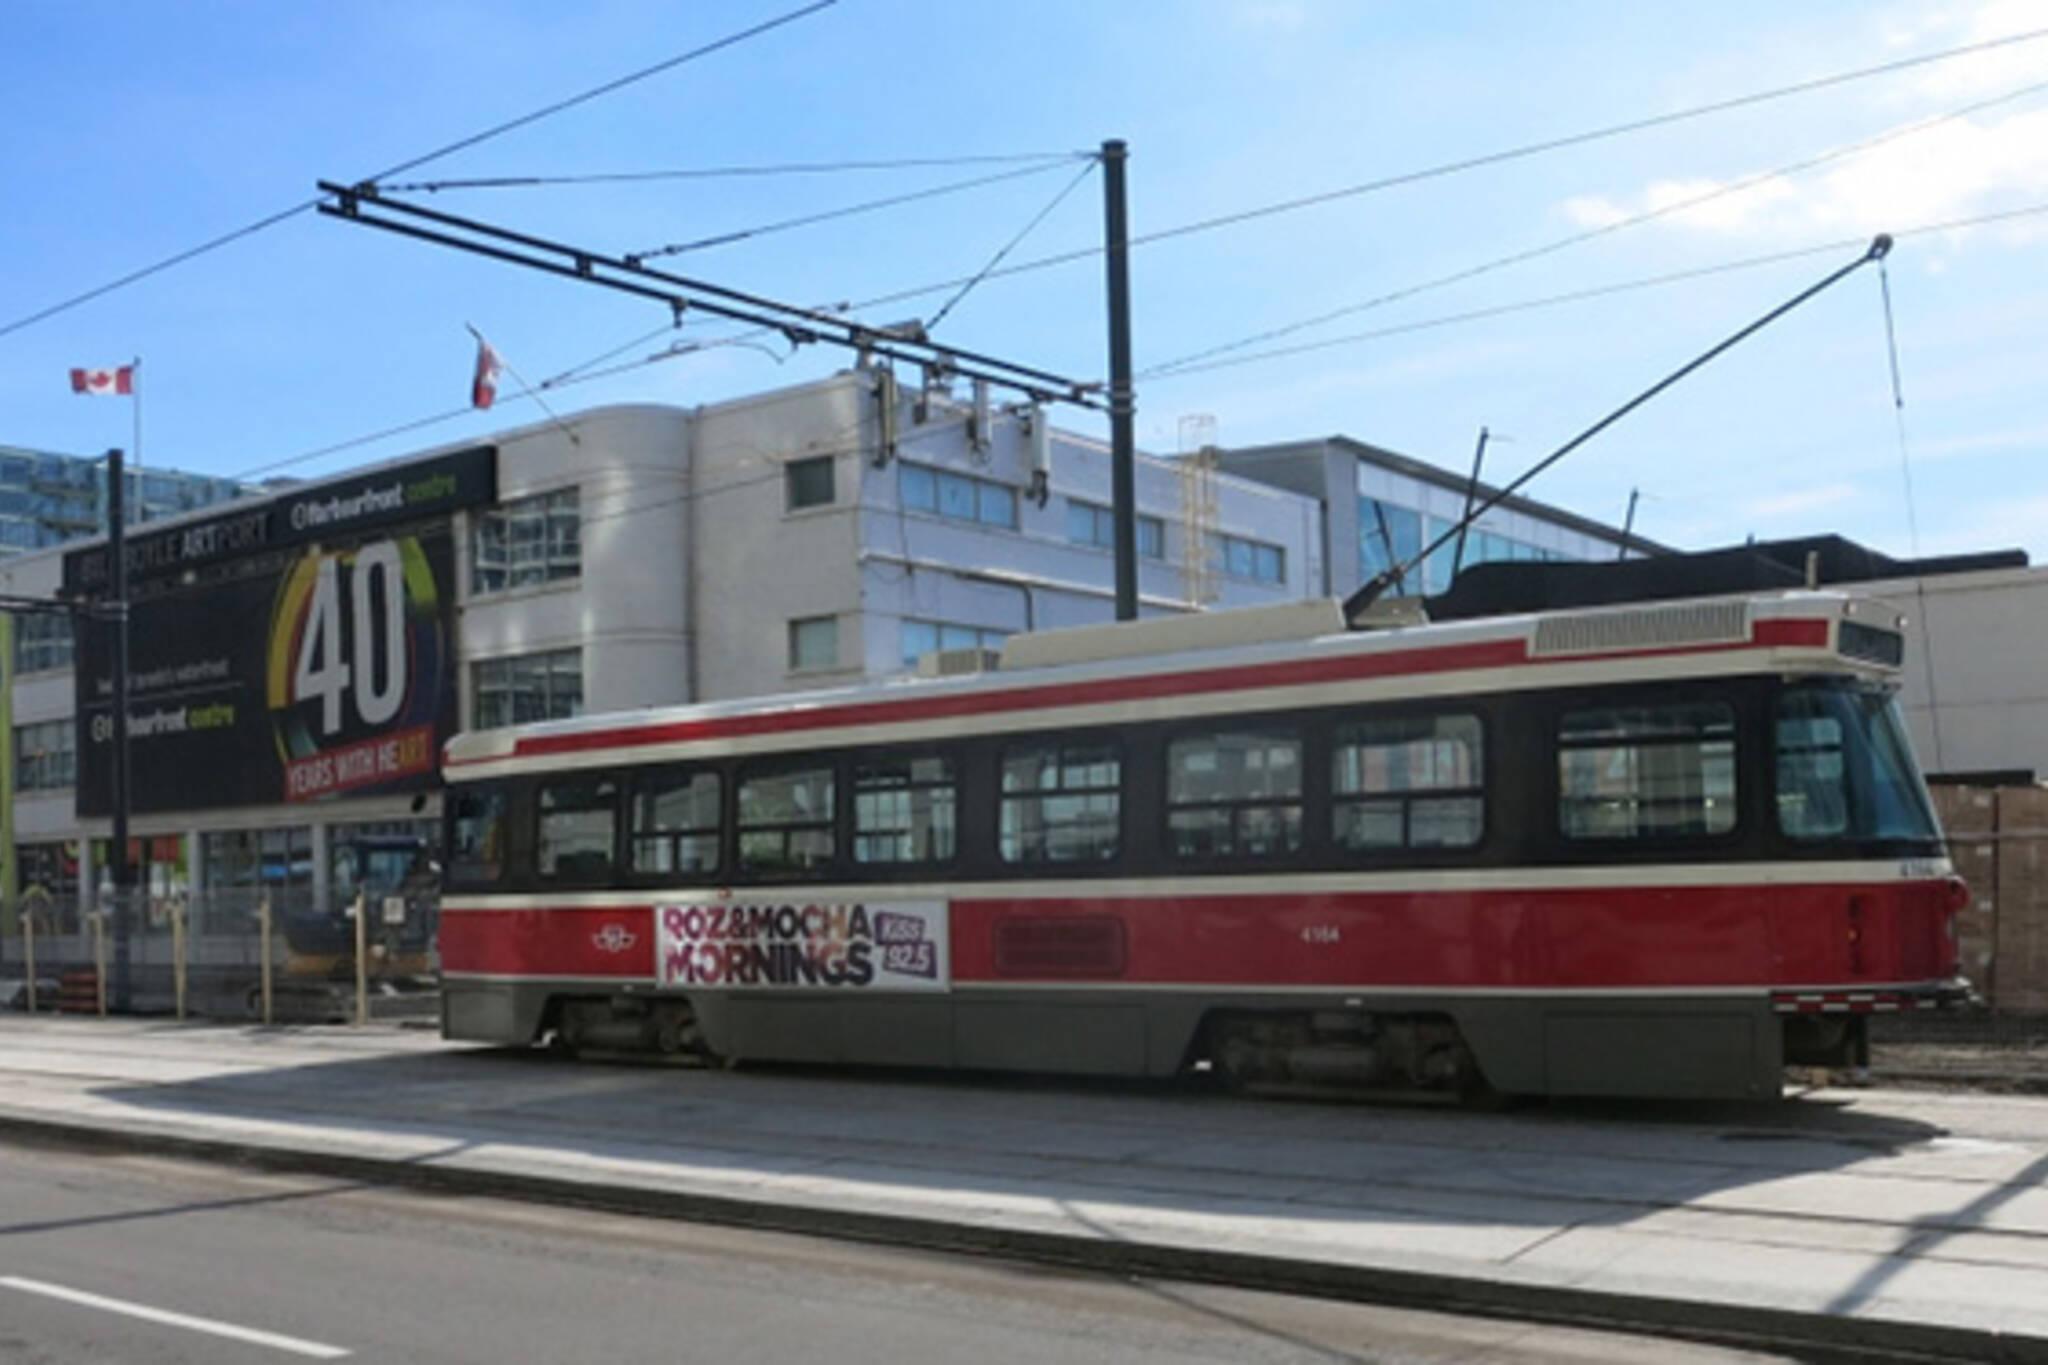 509 streetcar